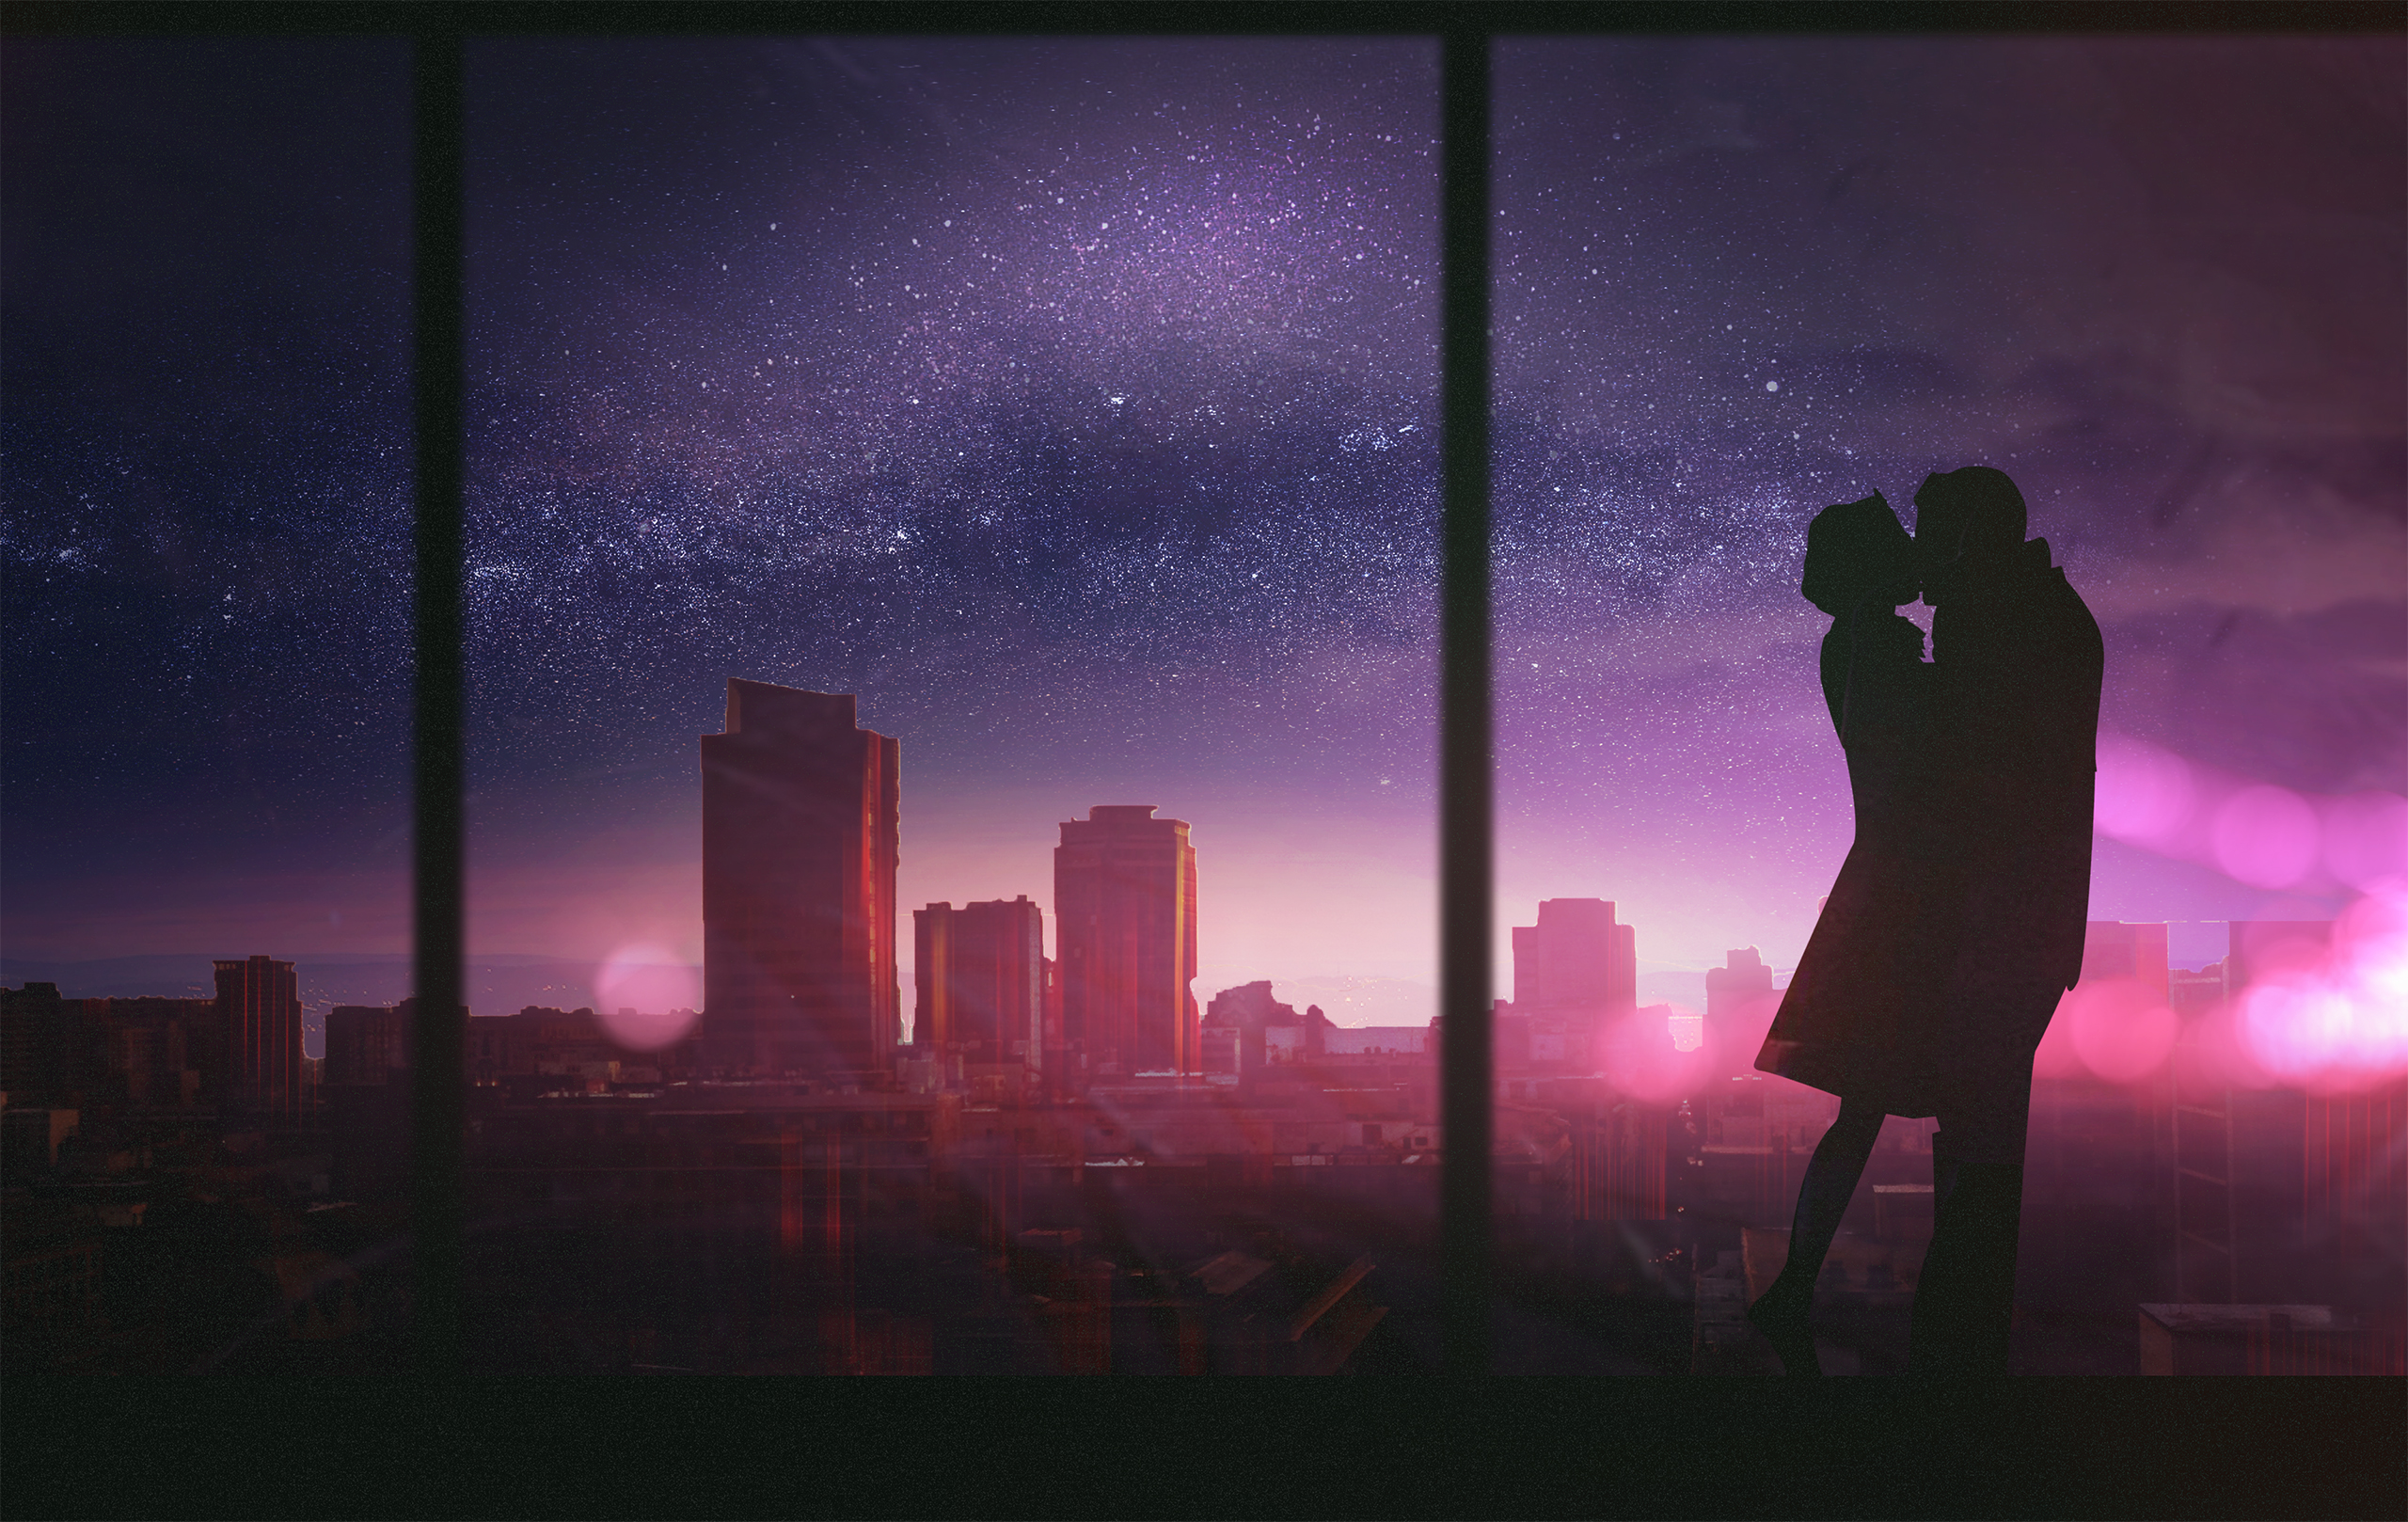 1152x864 Couple Romantic Kissing 1152x864 Resolution Hd 4k